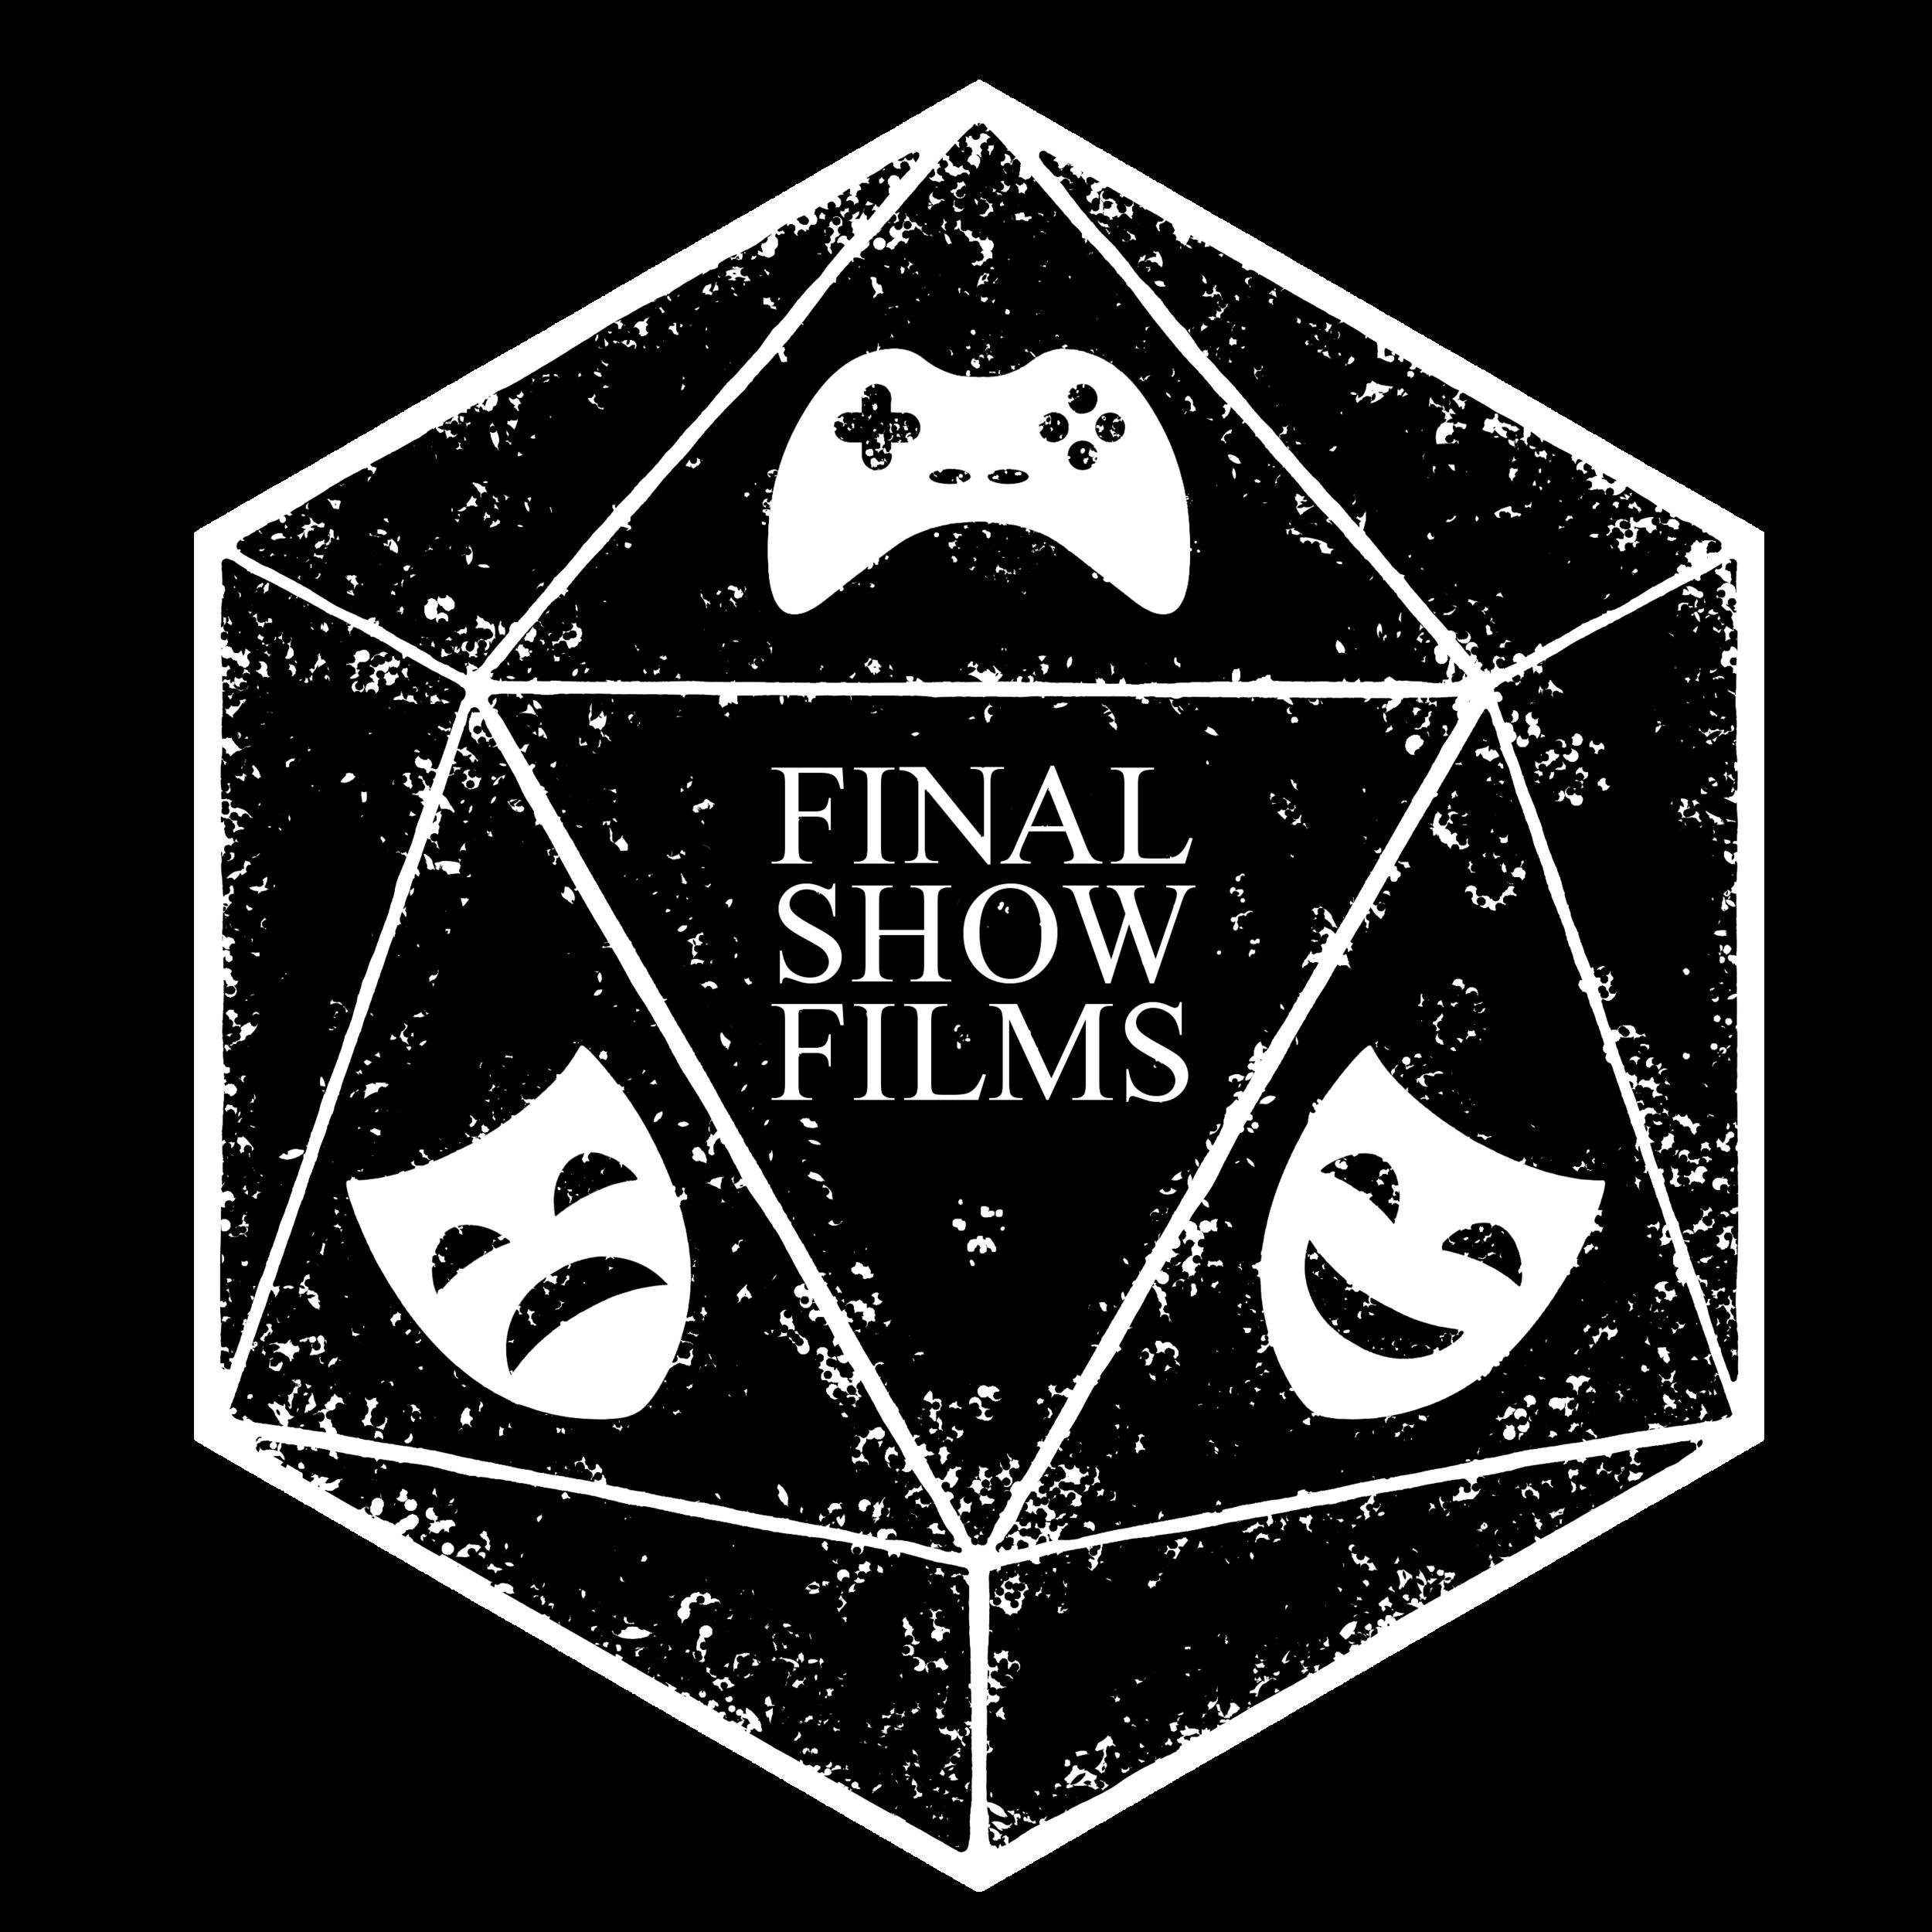 Final Show Films 02.png